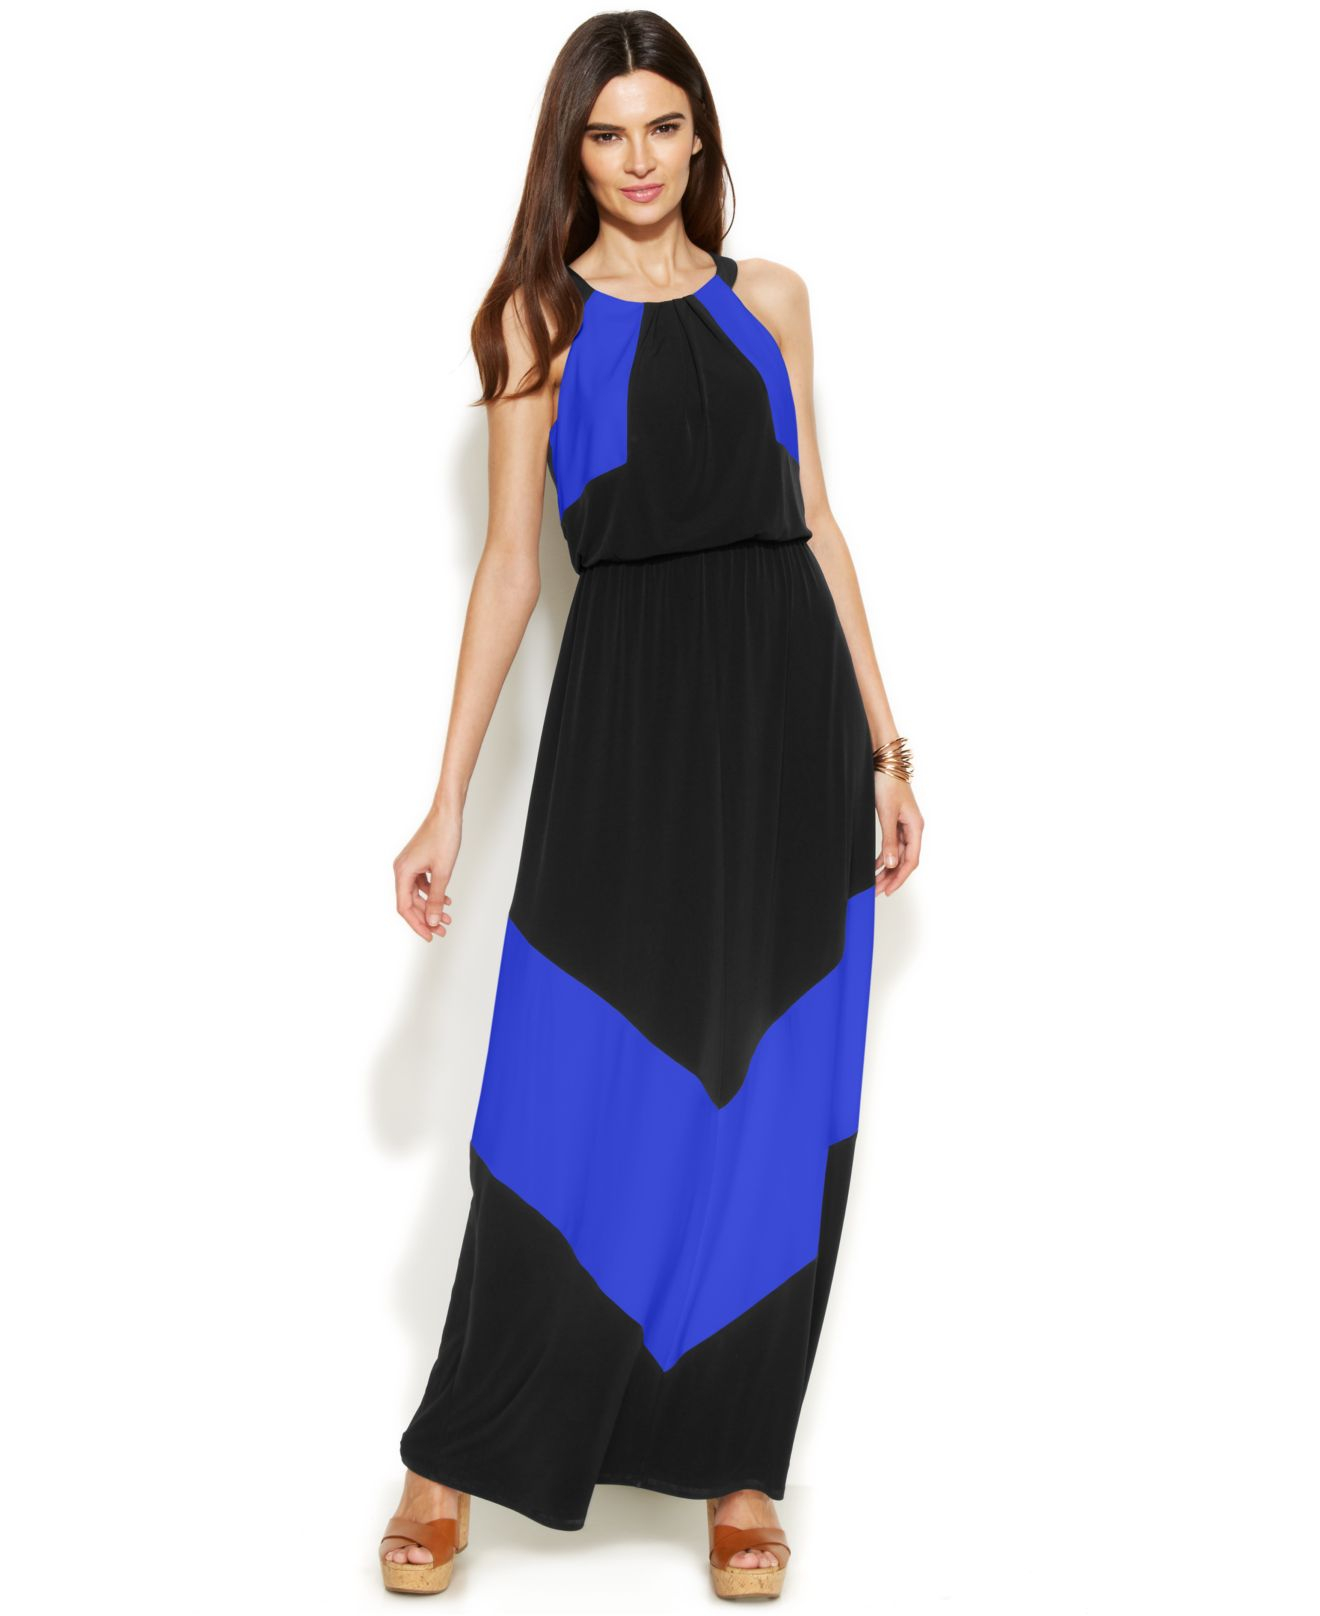 Vince colorblock maxi dress